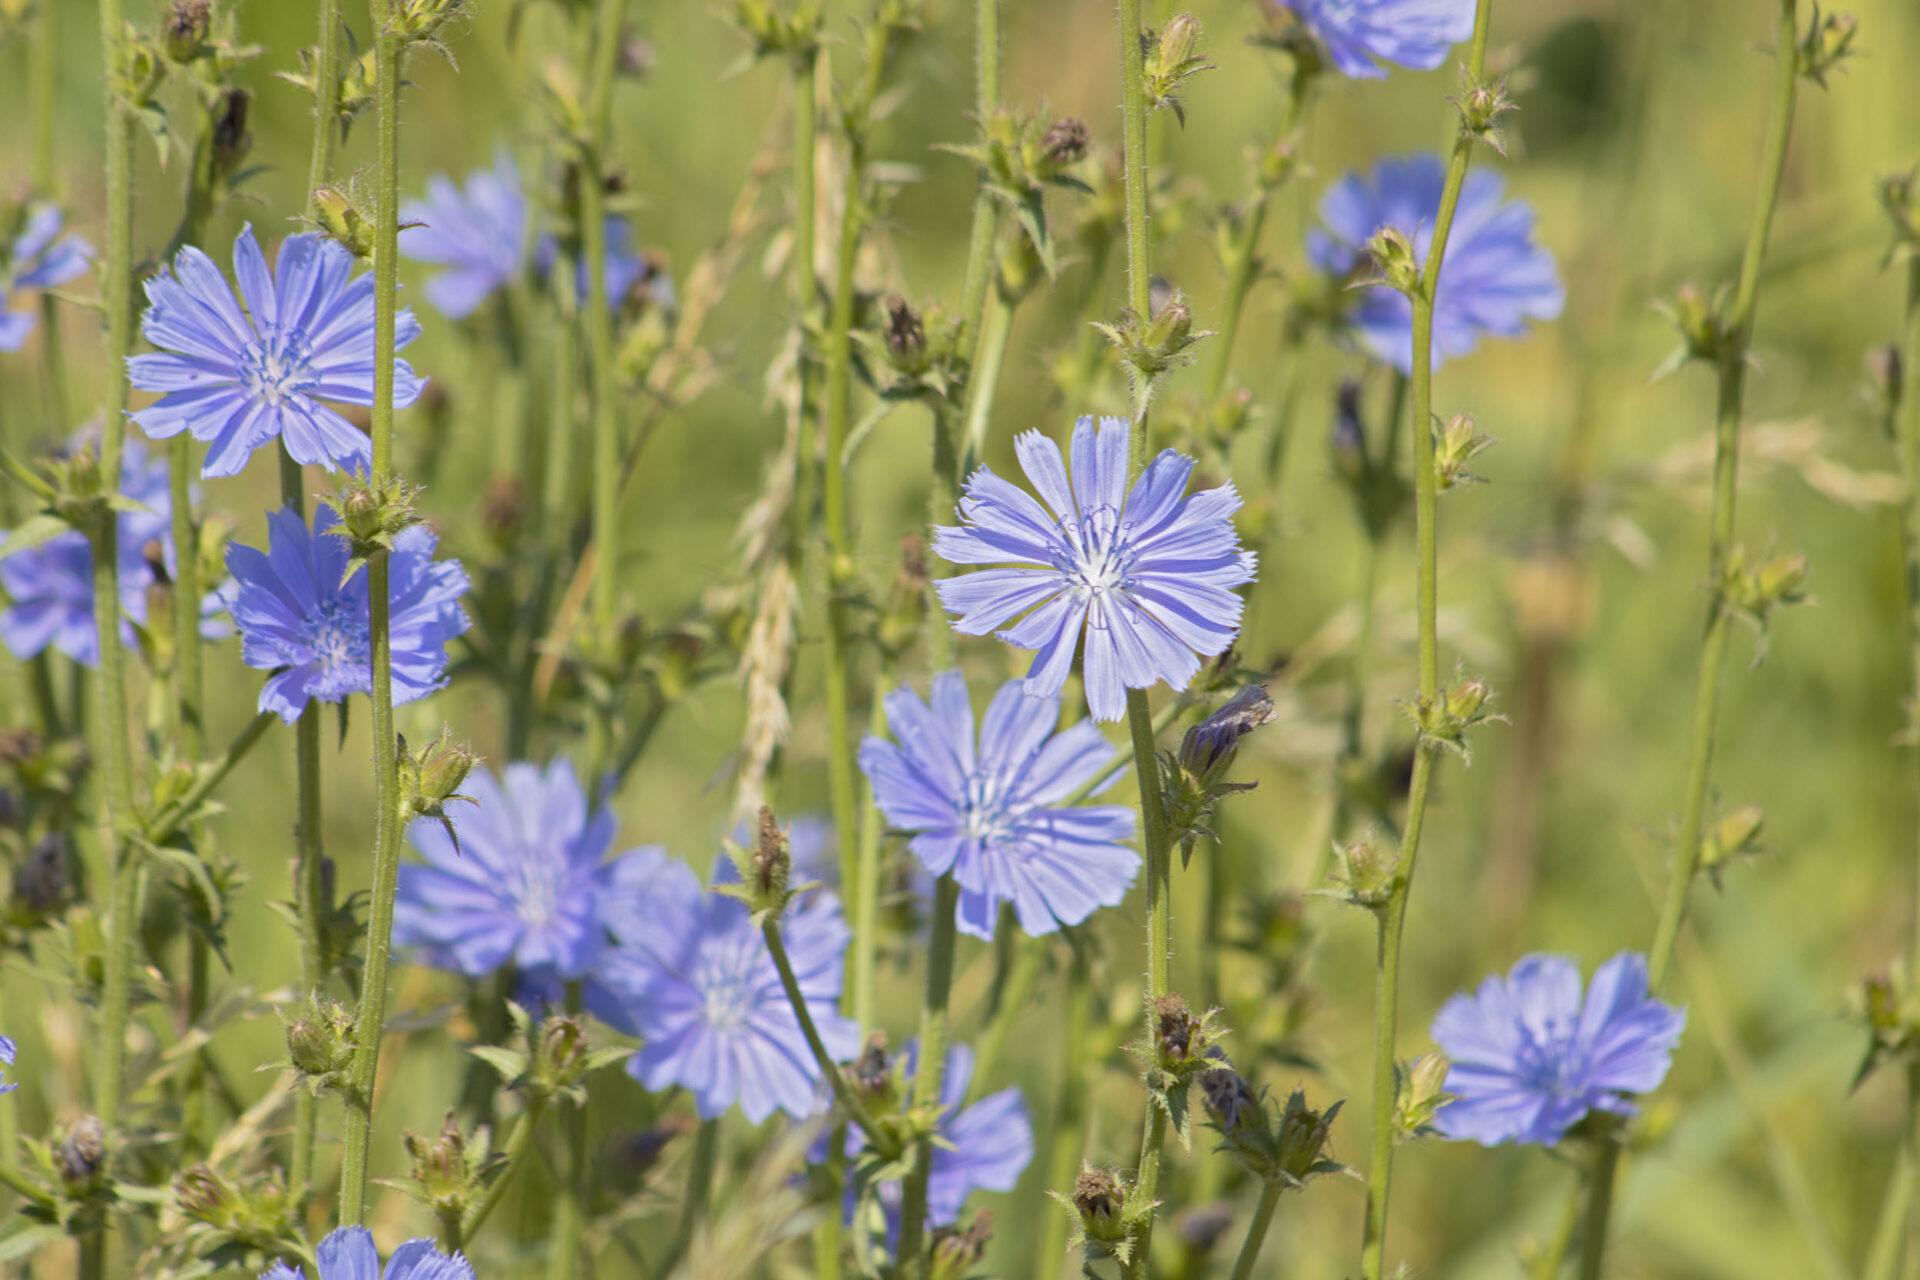 Wildflowers, July 19, 2021